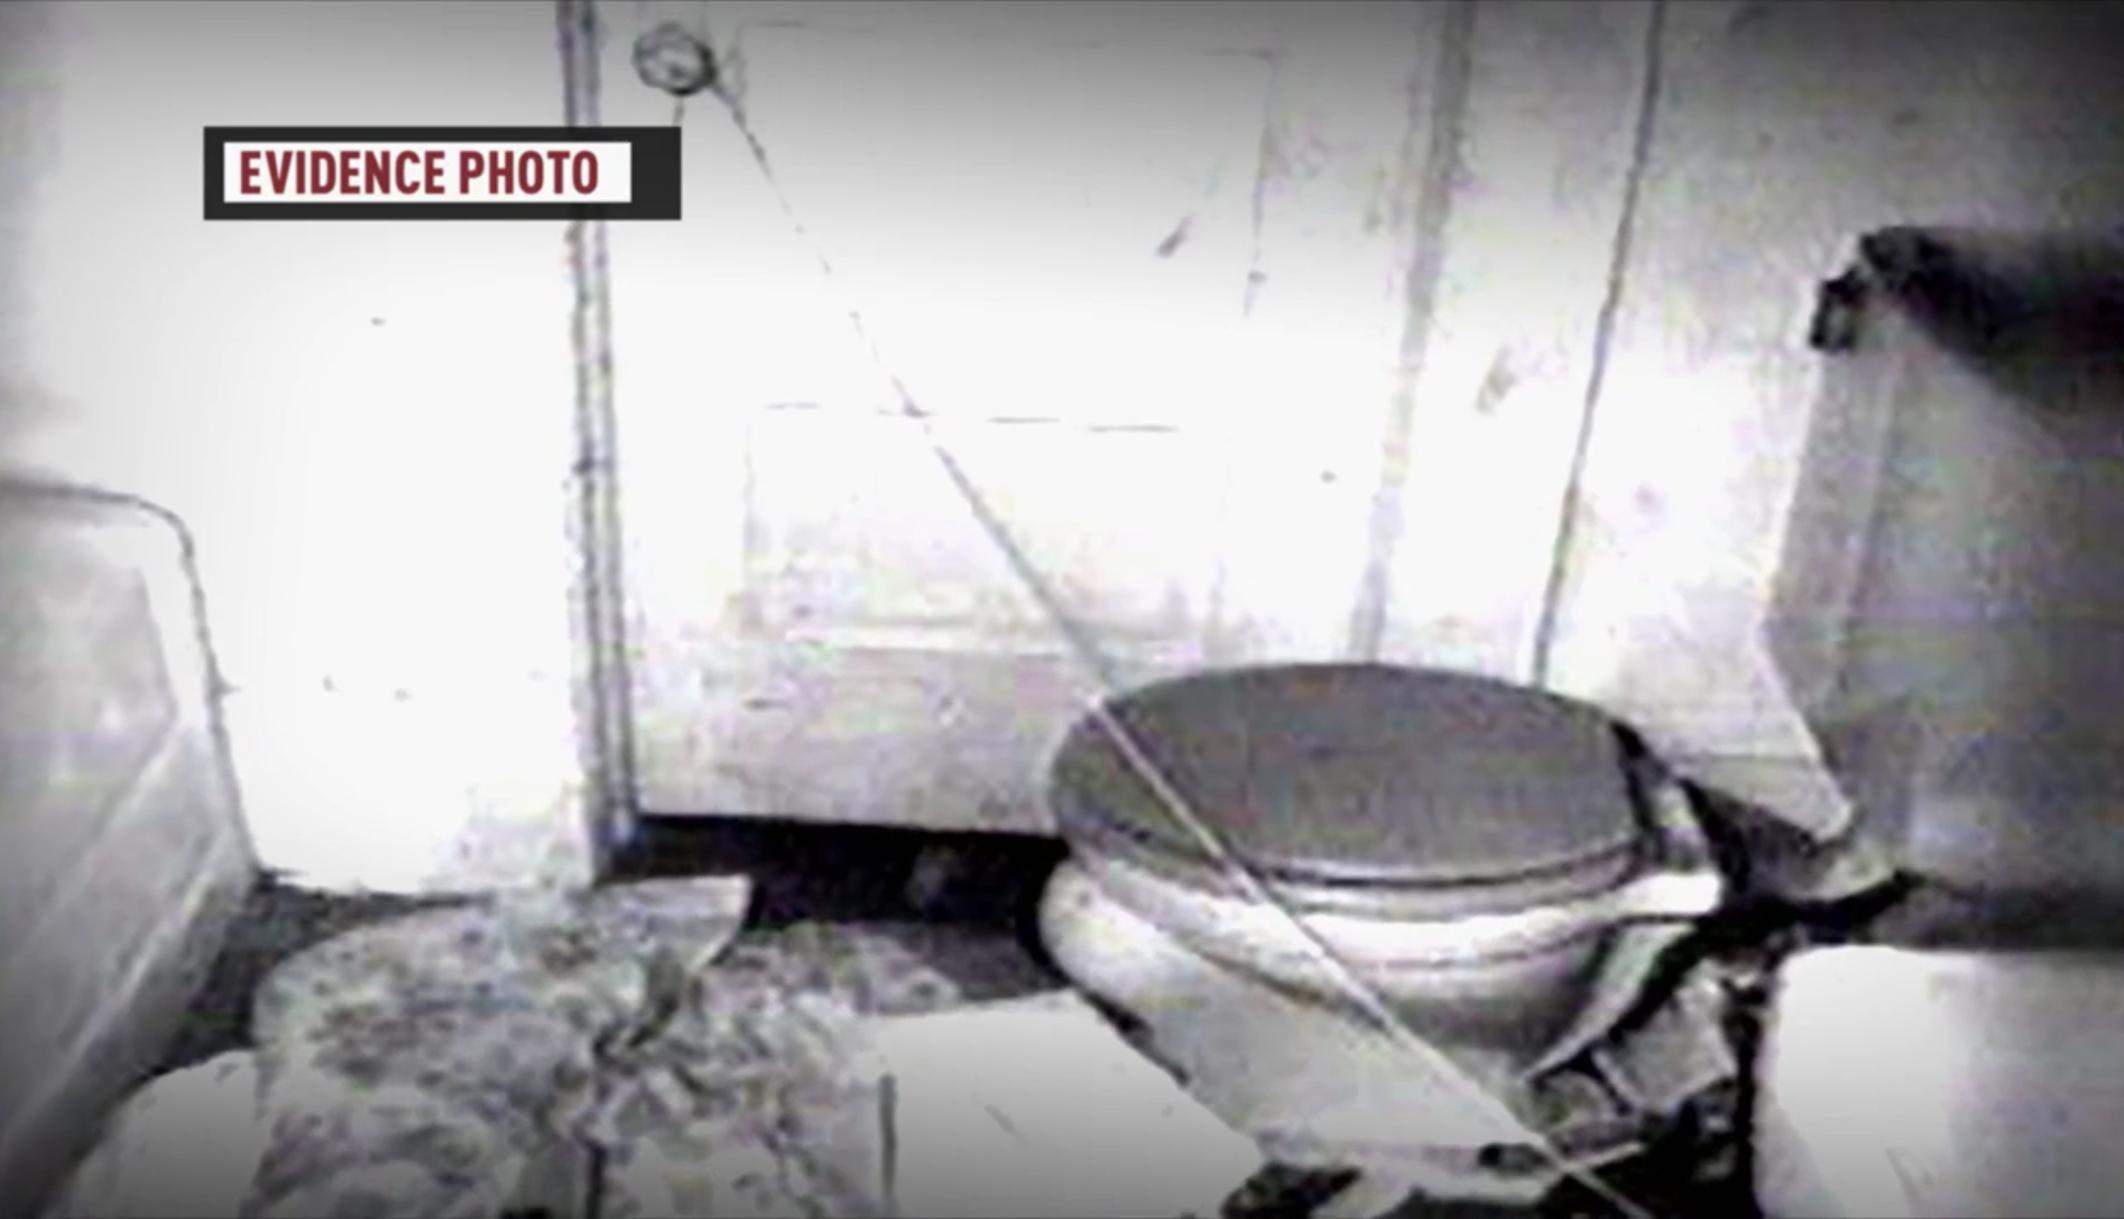 BTK Killer Crime Scene Photos: Dennis Rader's Twisted Murders